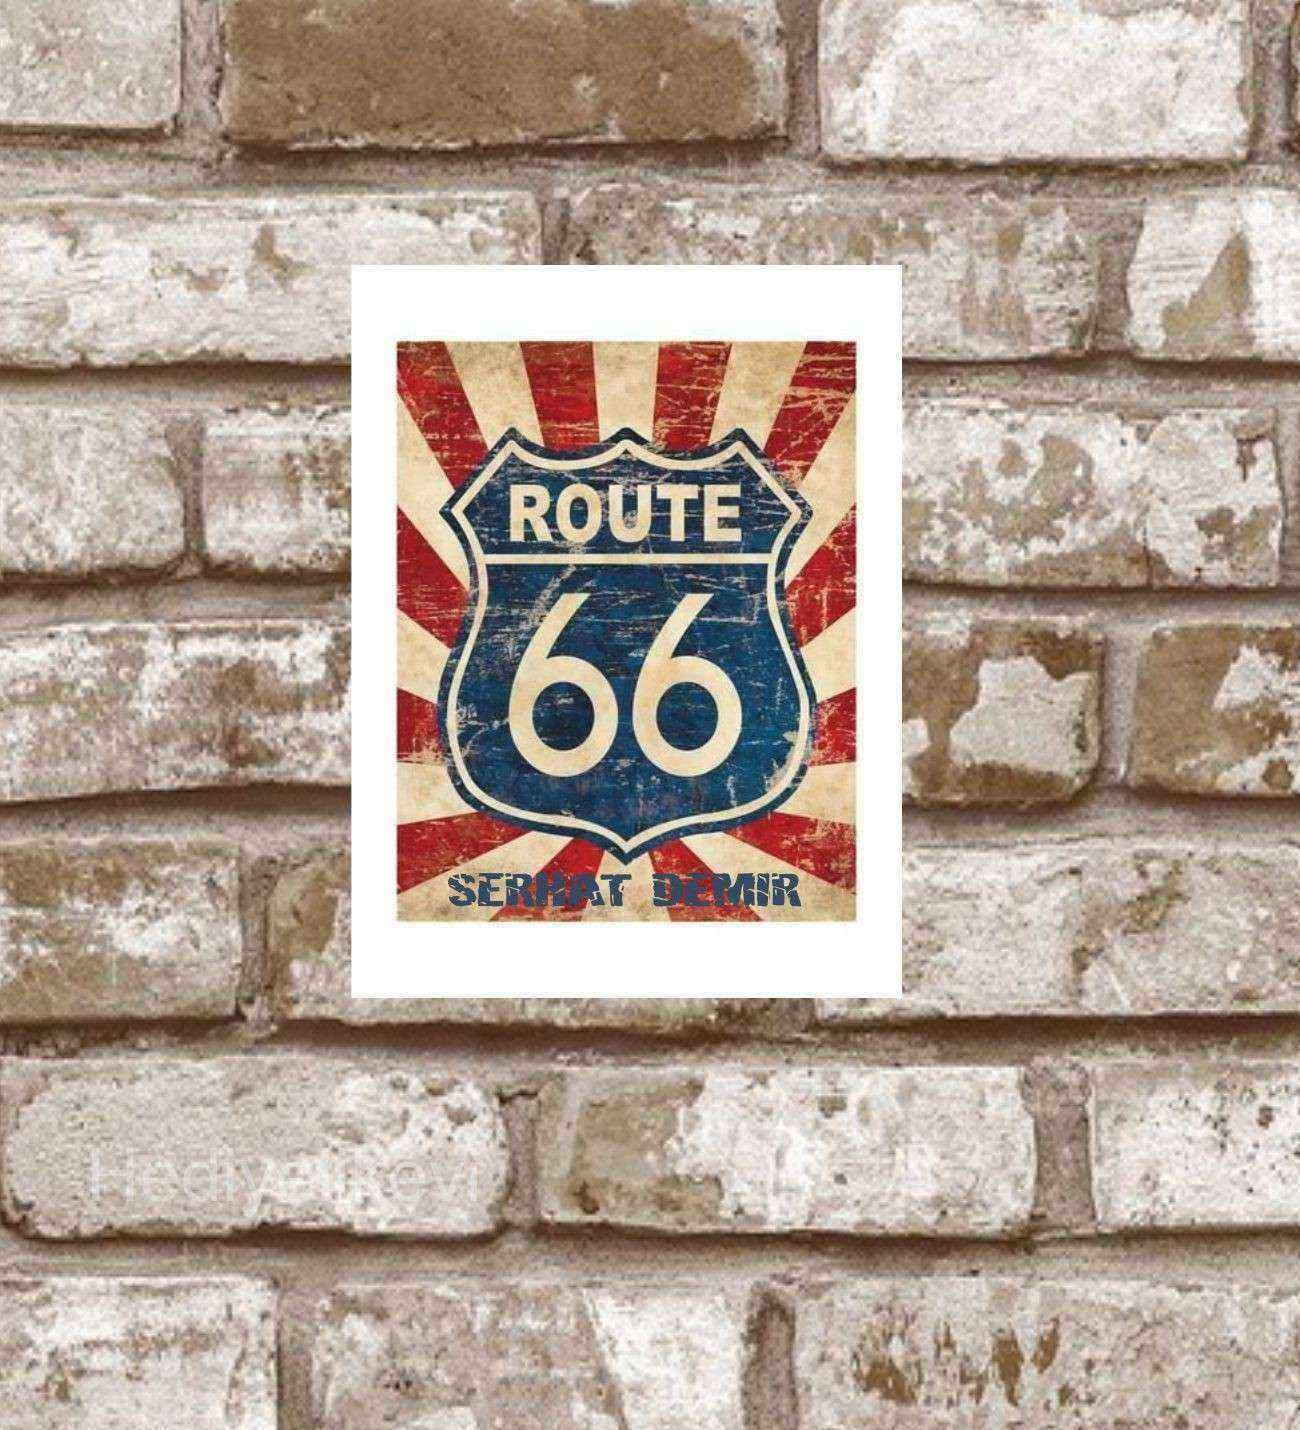 Kişiye Özel Metal  Route 66 Retro Poster (29x19)